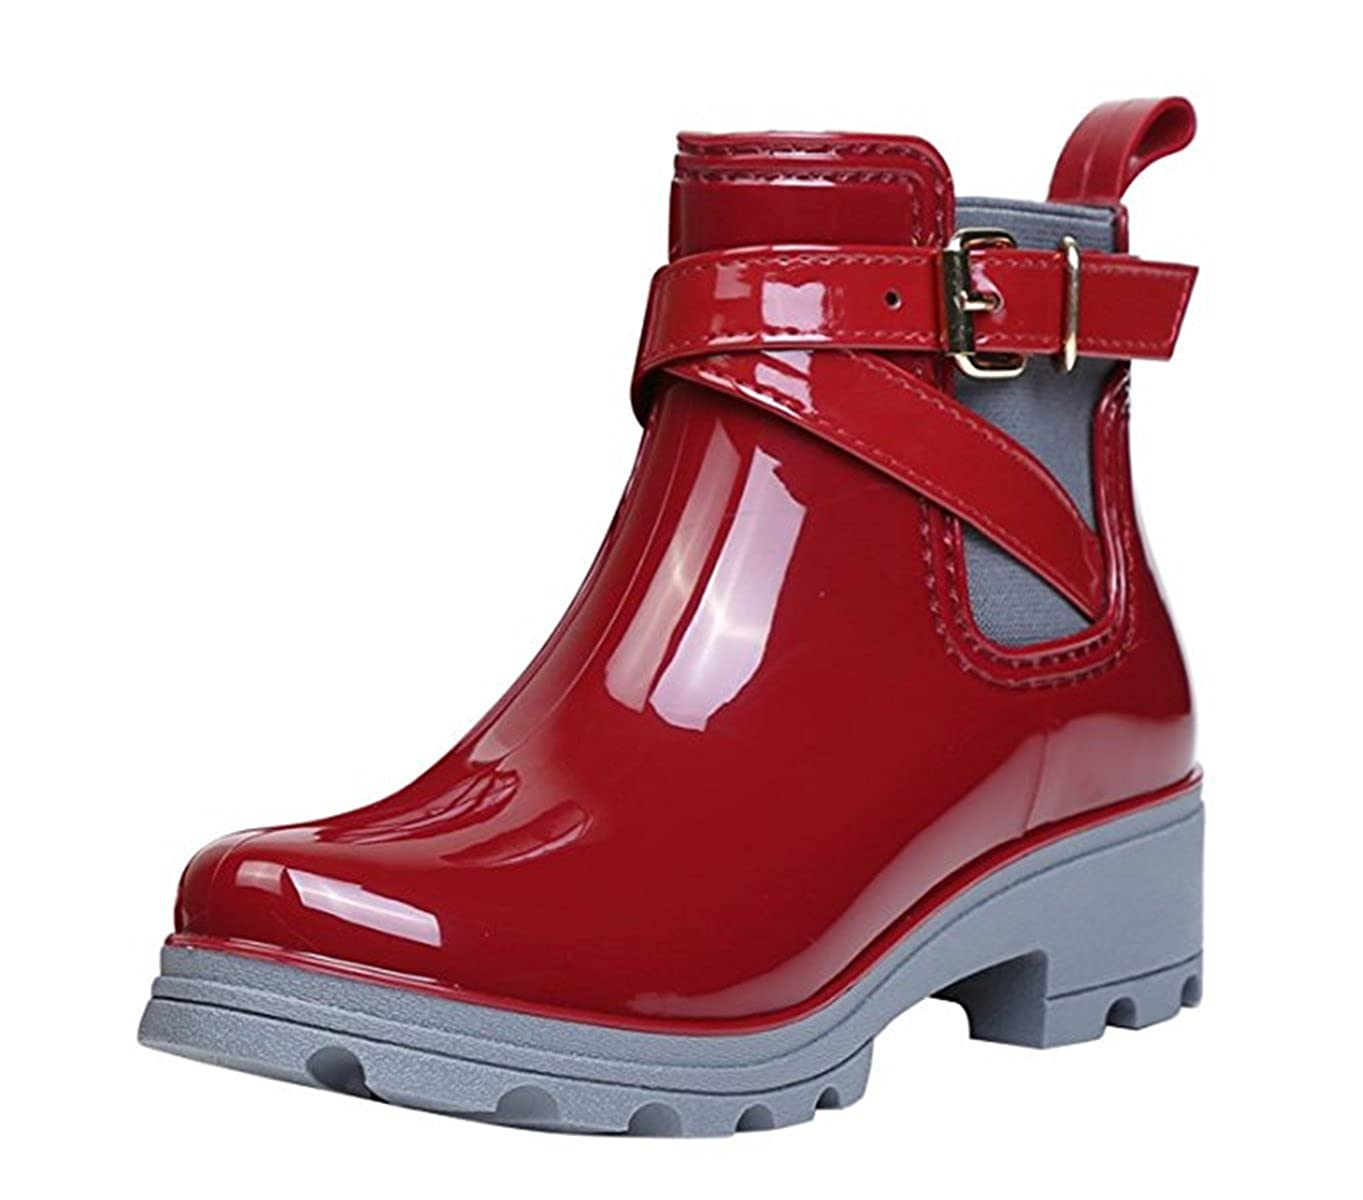 YOGLY Mujer Botas de Agua Bota de Goma Mujer Impermeable Lluvia Zapatos